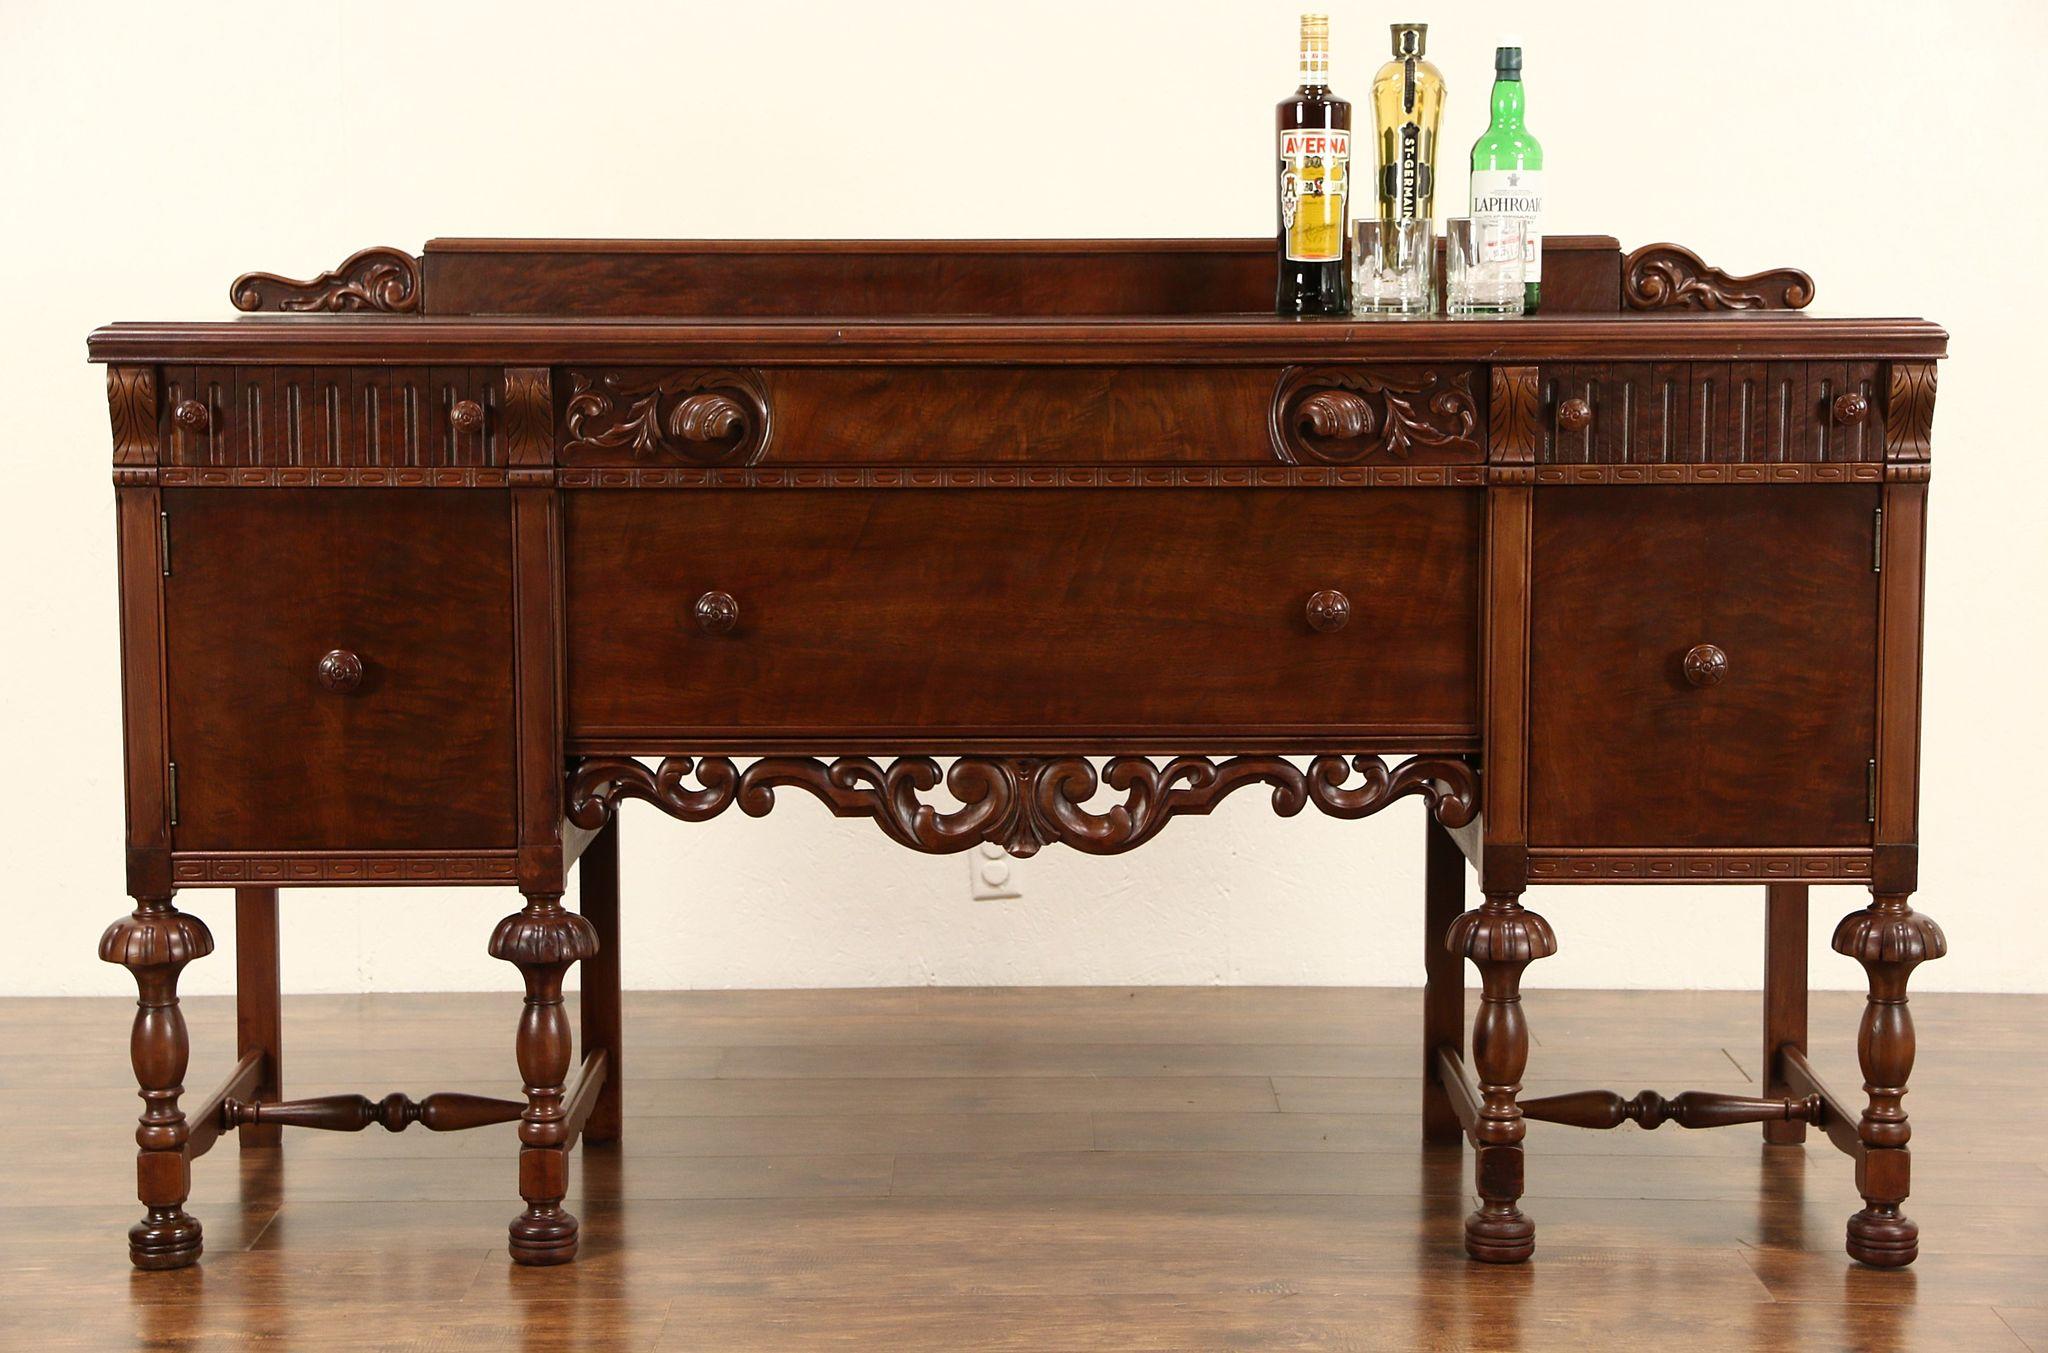 Good English Tudor Style 1925 Antique Sideboard Or Buffet, Walnut U0026 Burl, Signed